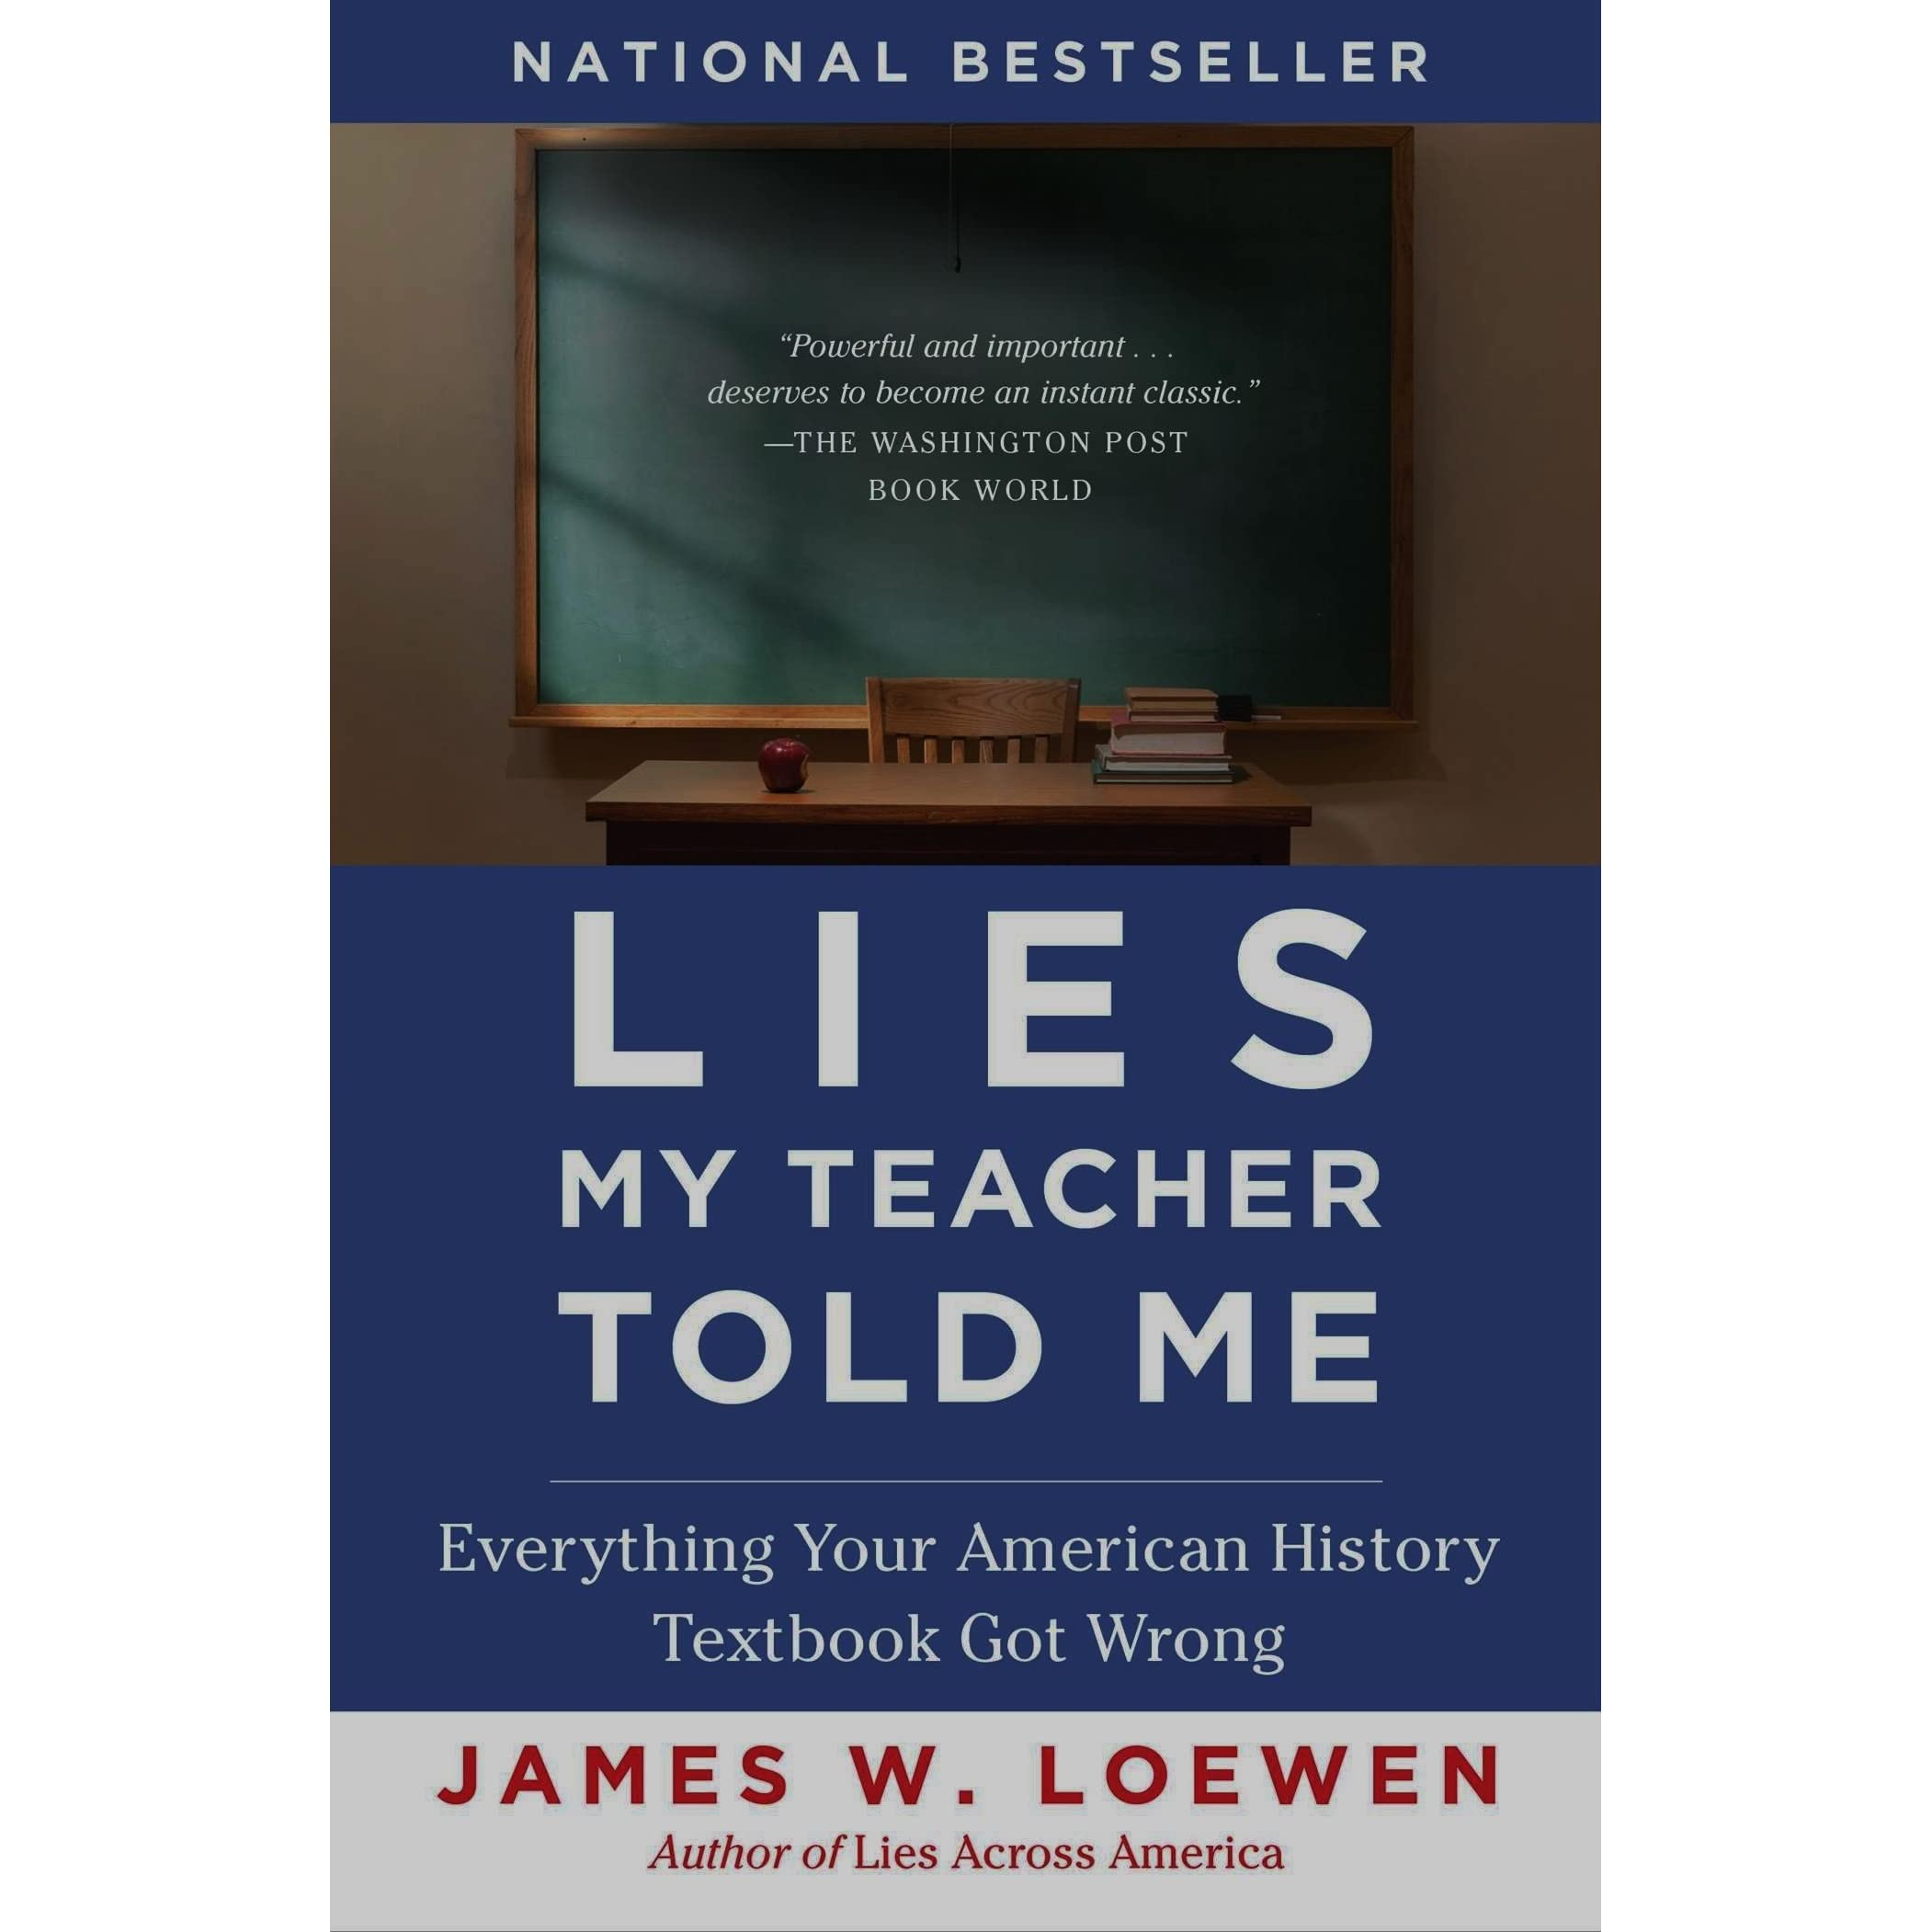 an analysis of james w loewens book lies my teacher told me